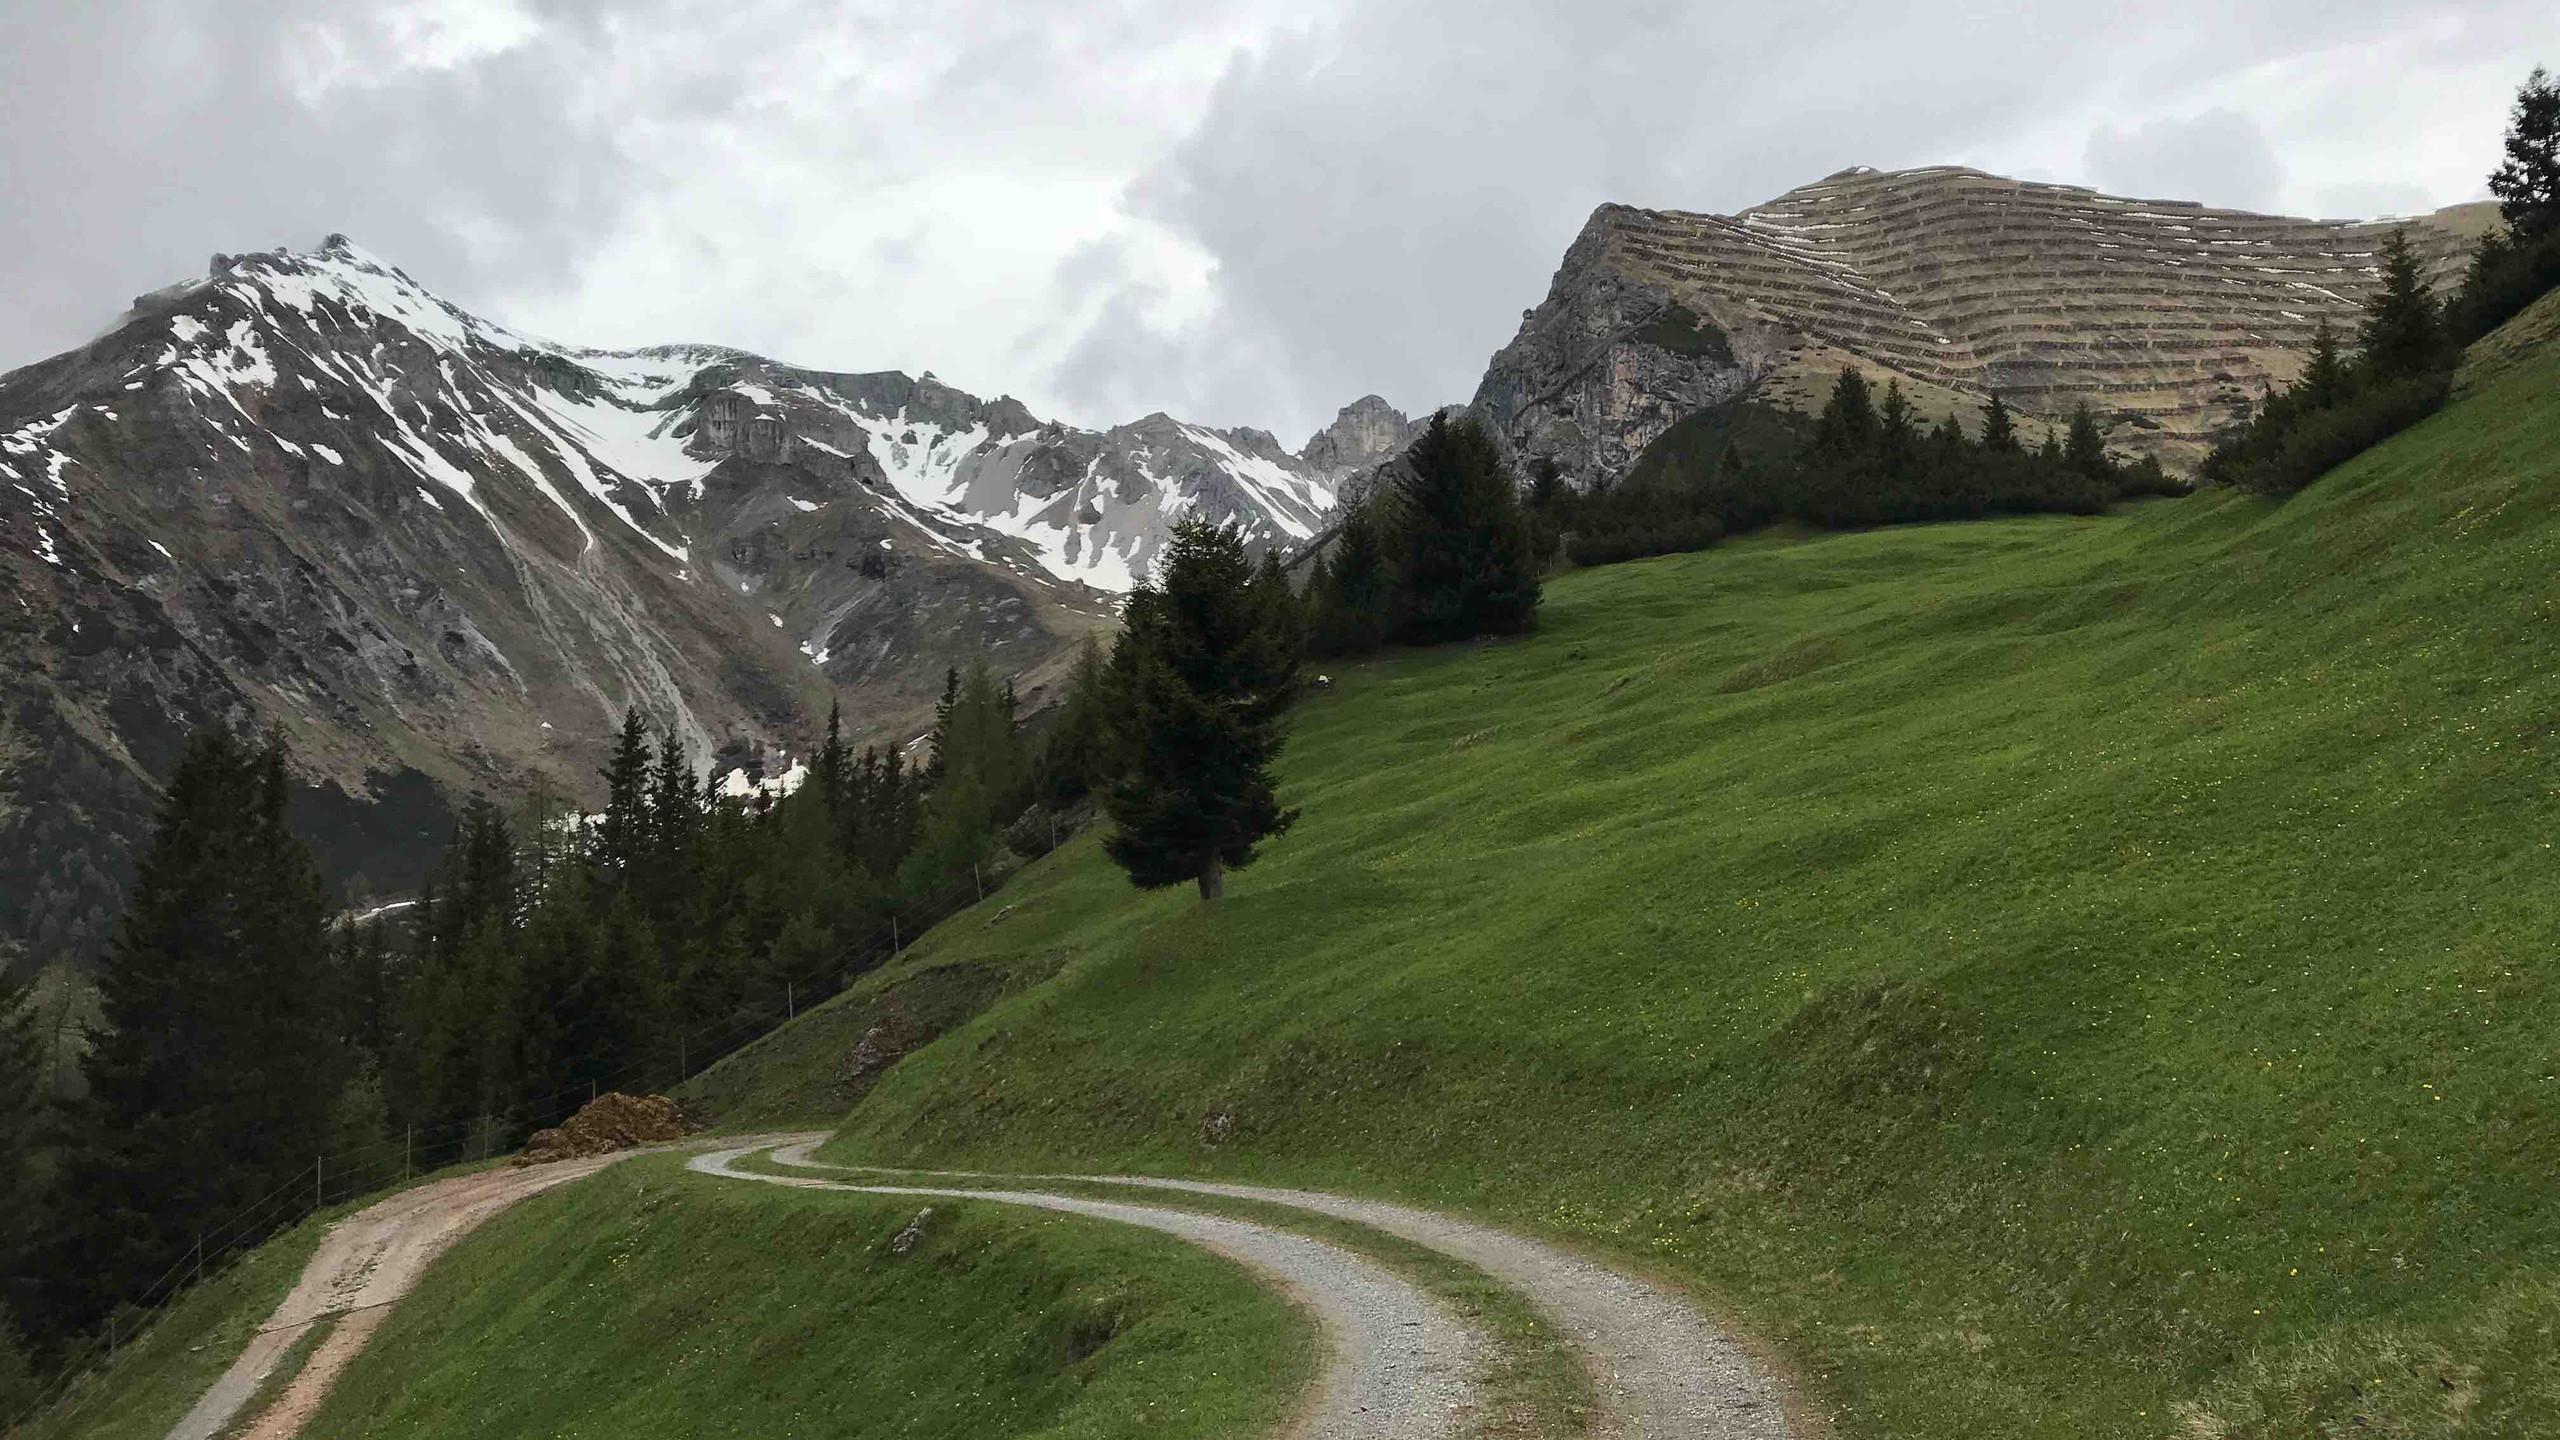 Forstweg ueber satte gruene Wiesen, Biketour Gschnitztal